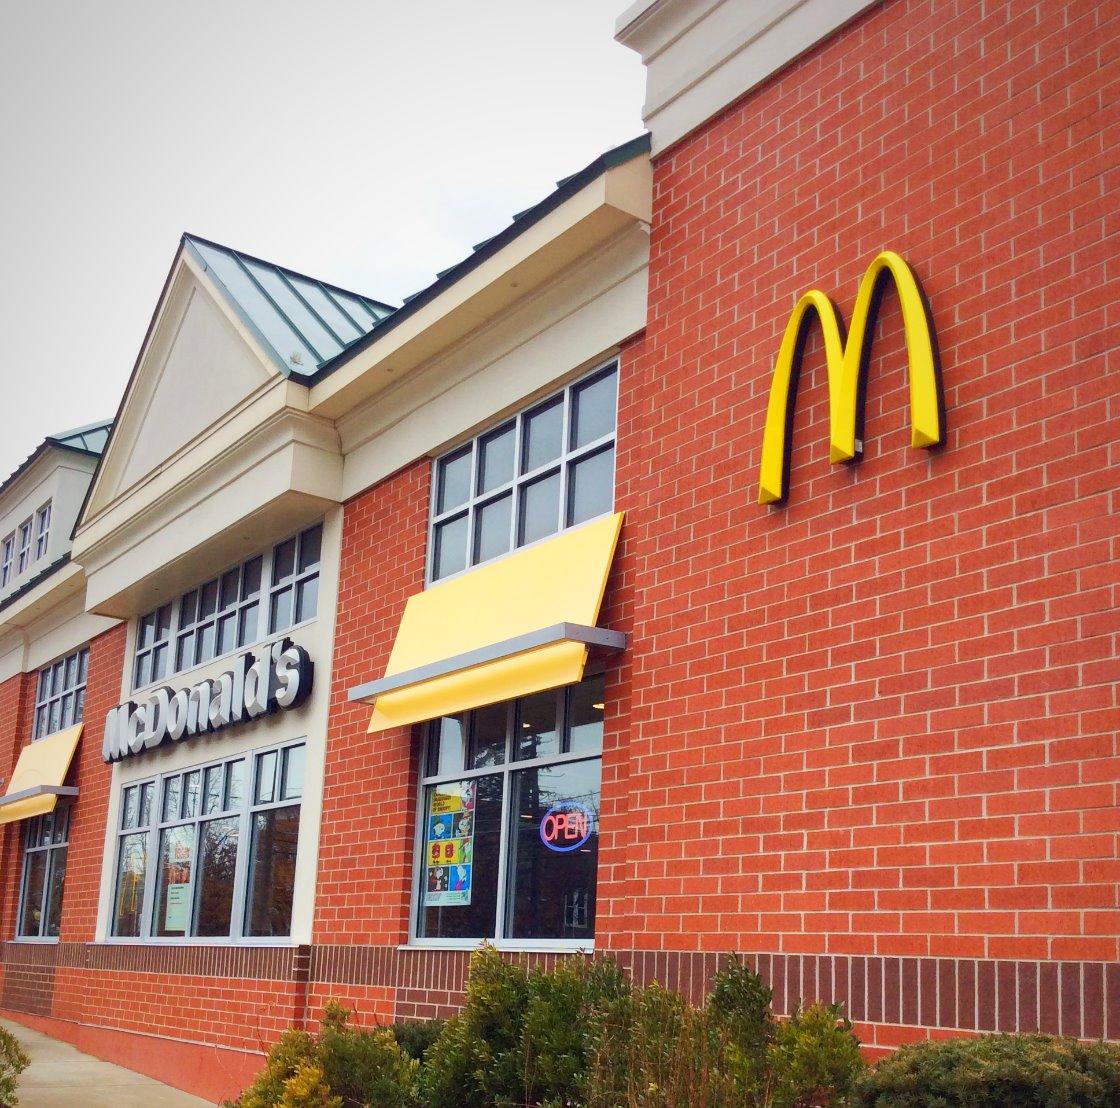 McDonald's in Saratoga Springs, NY